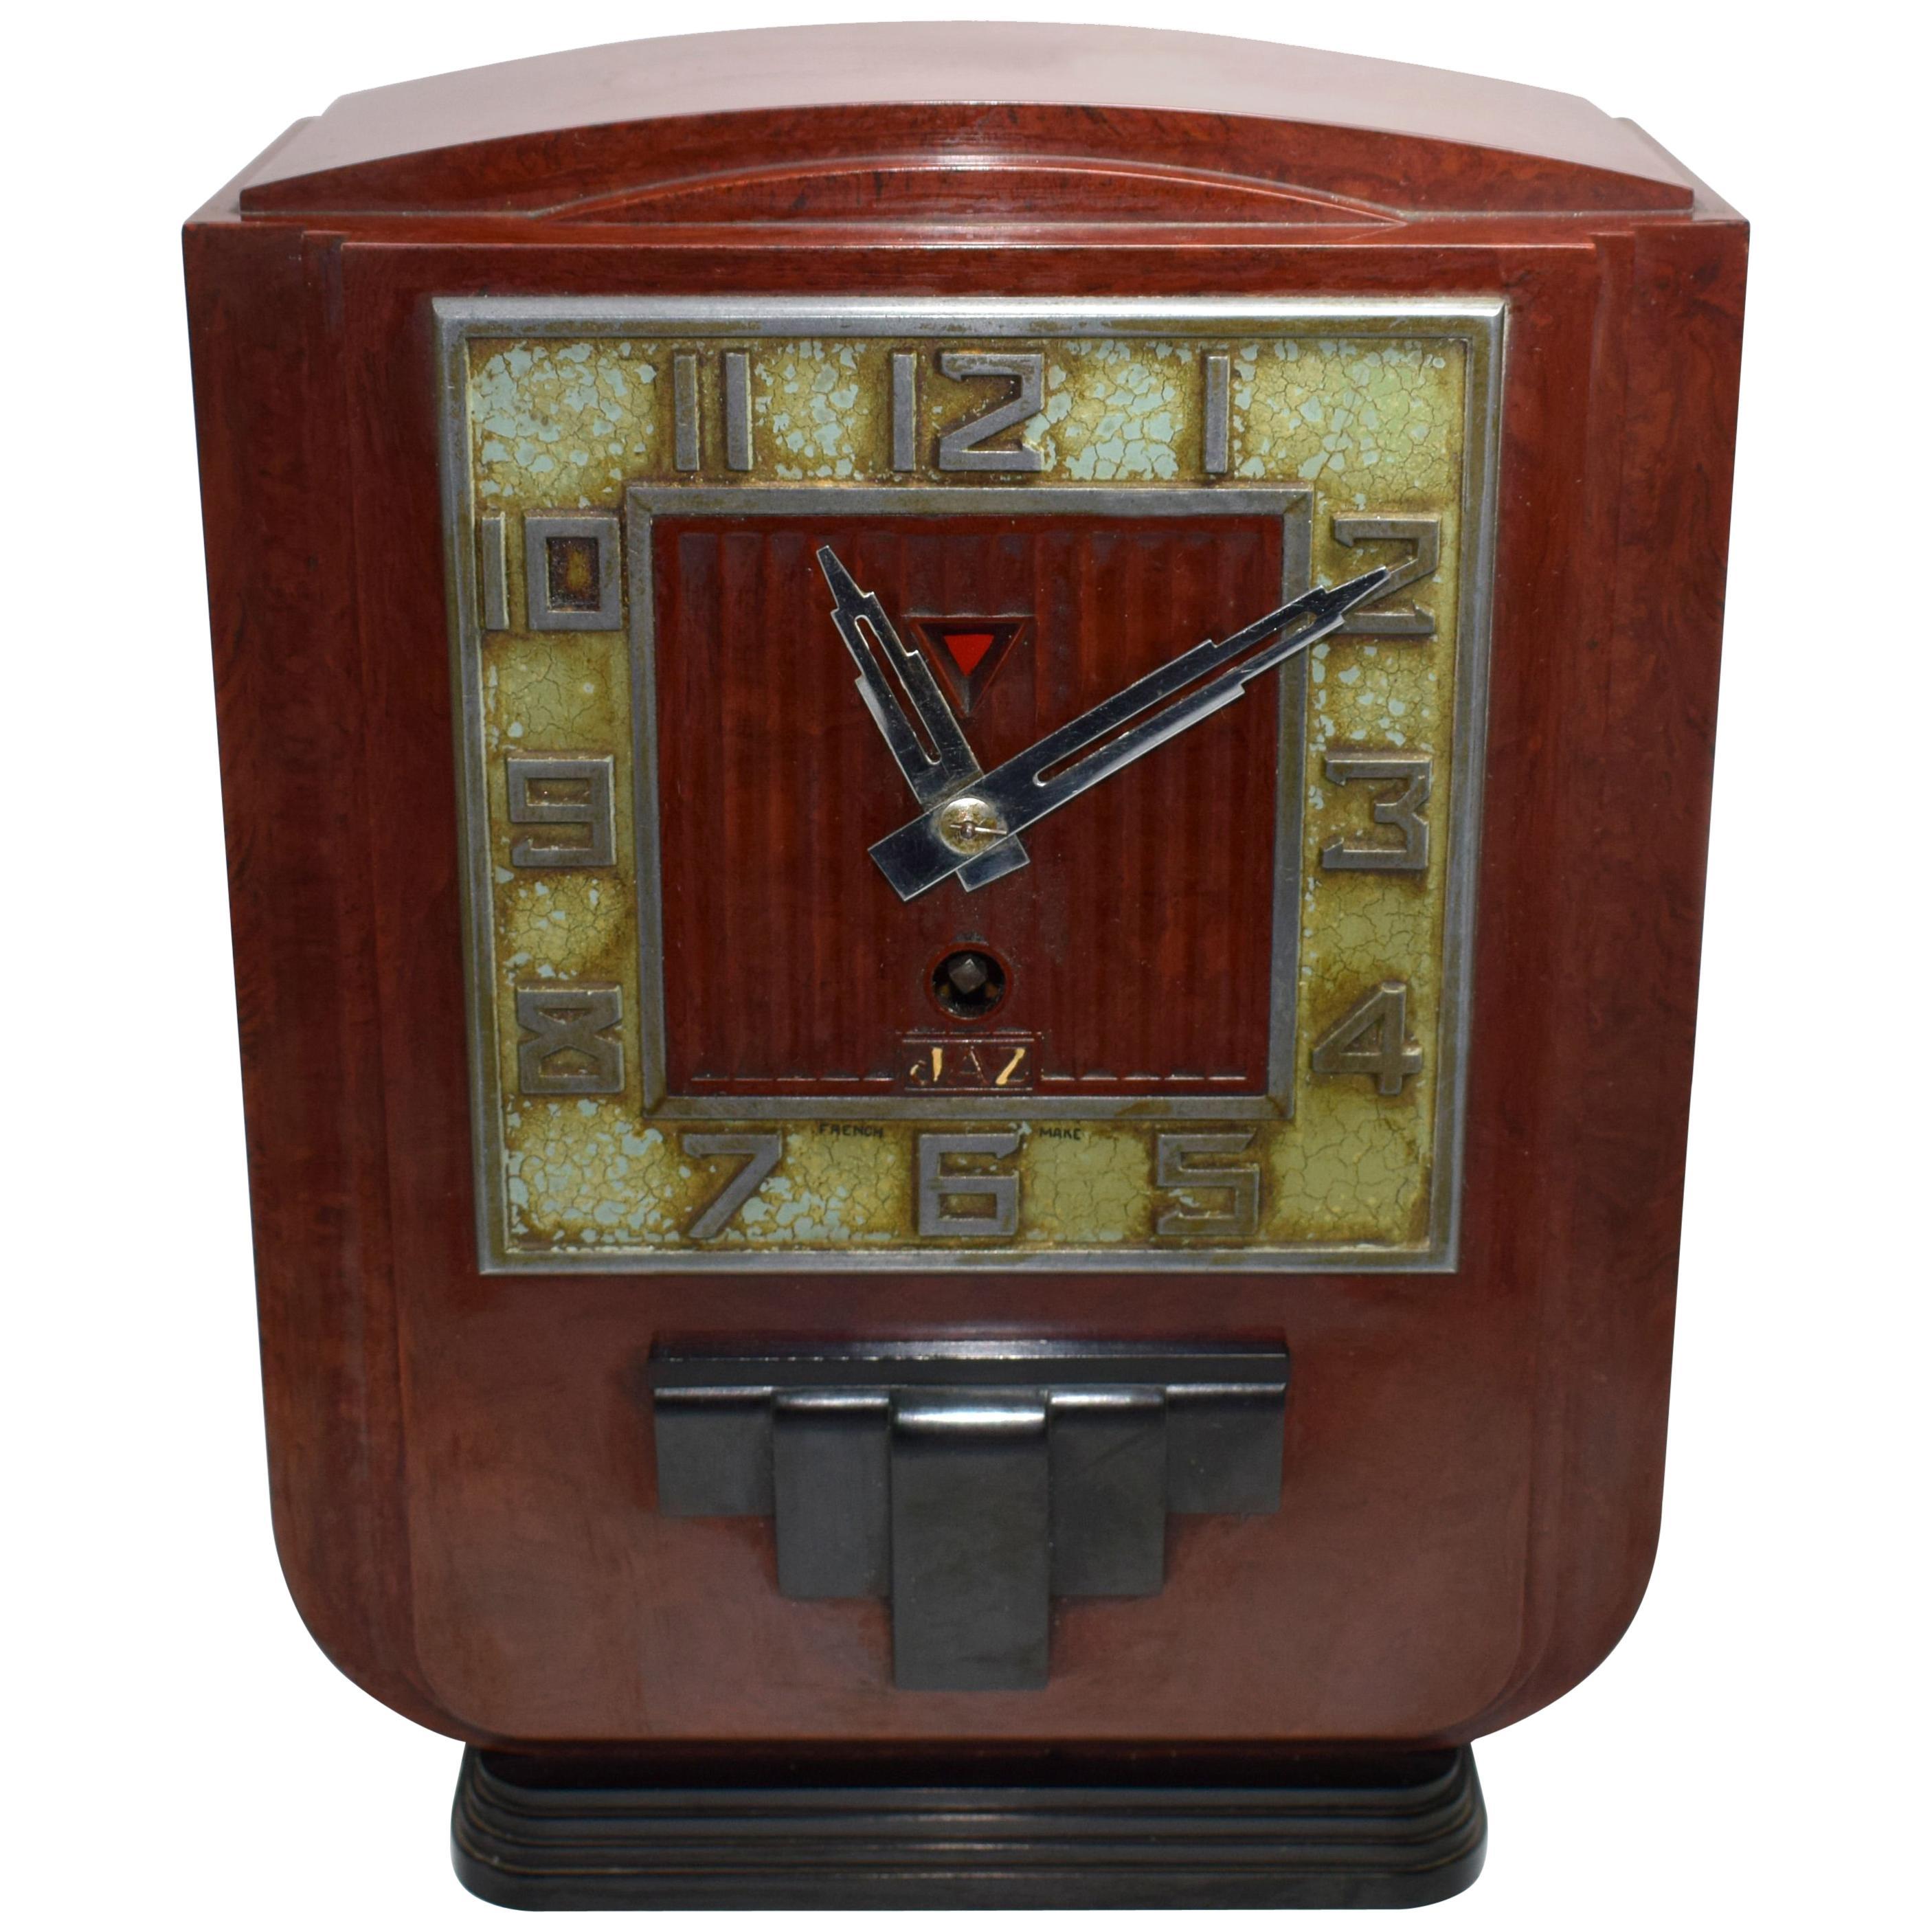 Large and Impressive 1930s Art Deco Red Bakelite Mantle Clock by JAZ